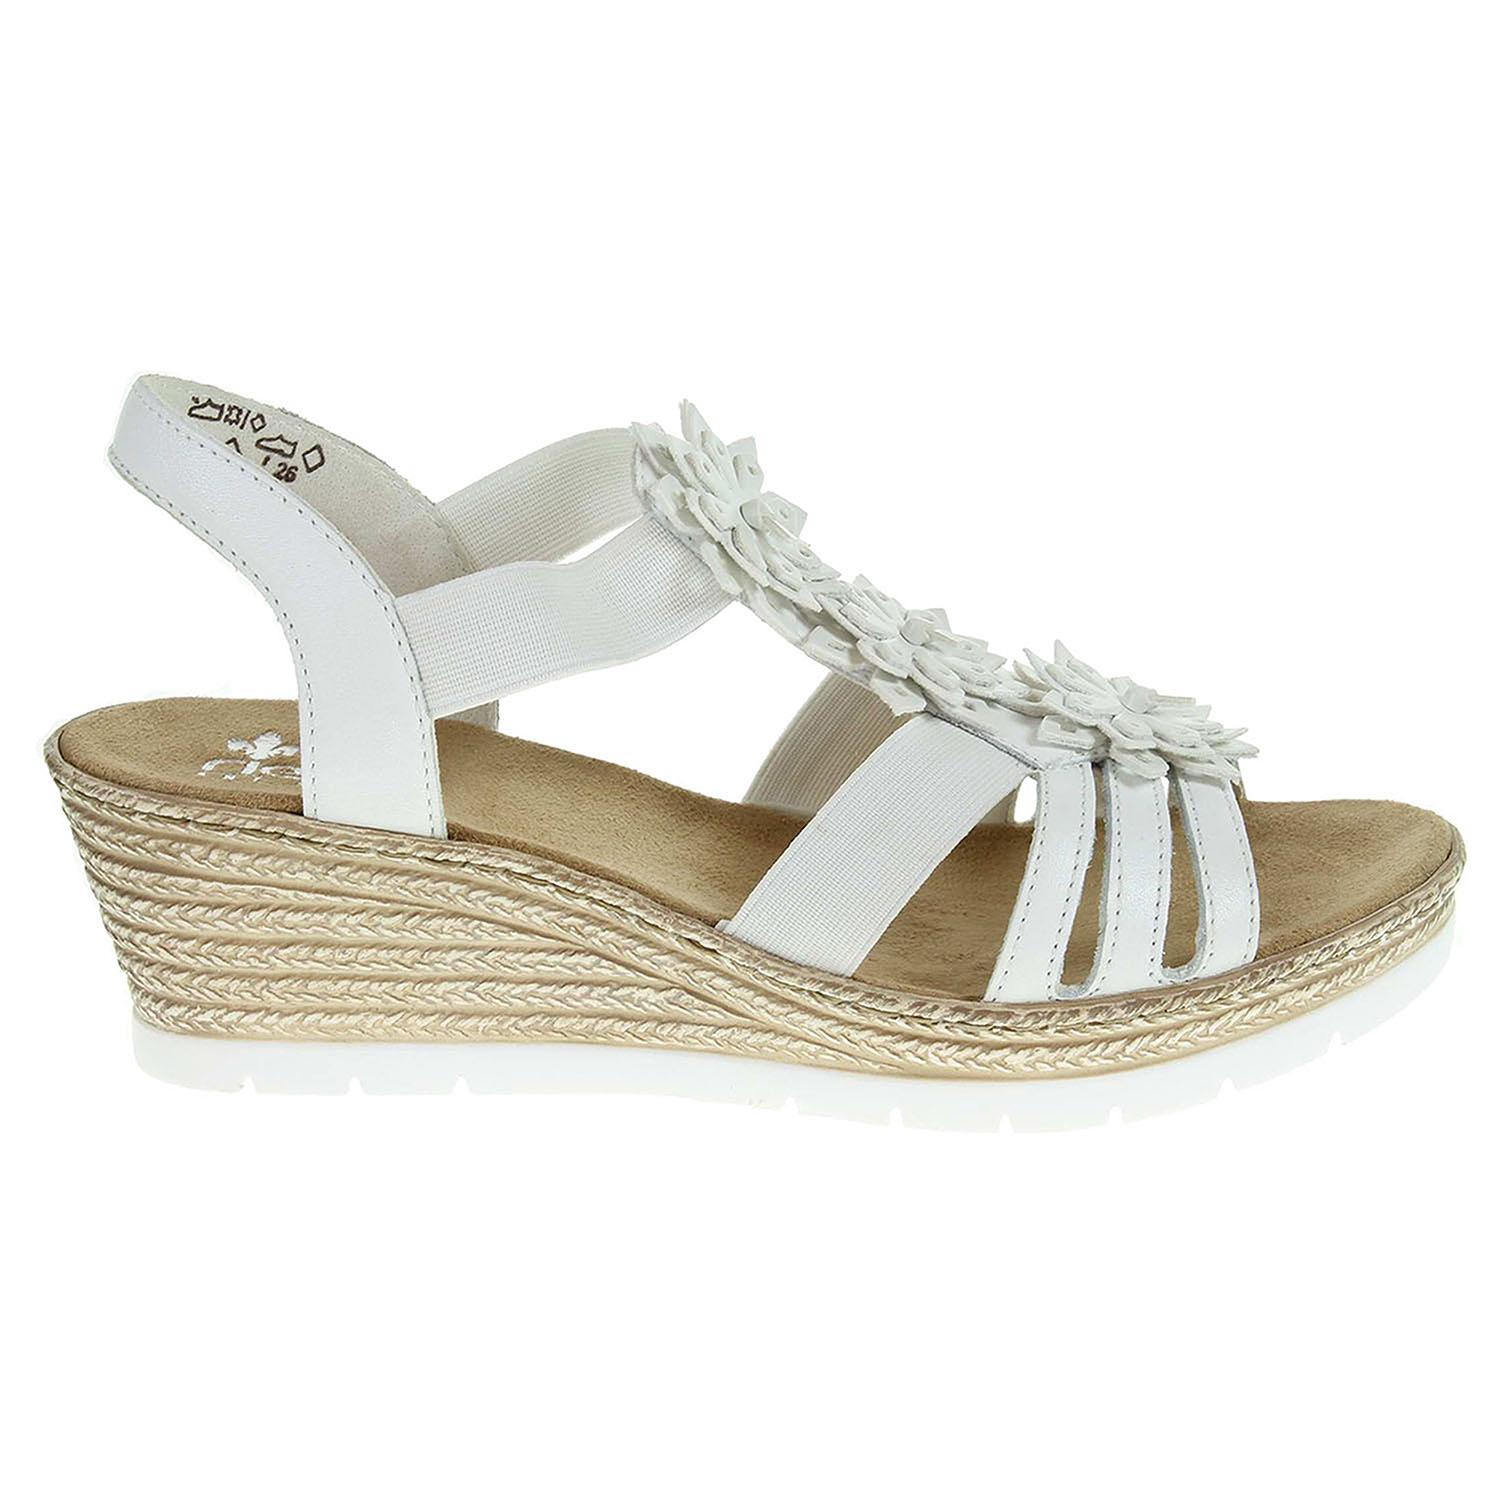 Ecco Rieker dámské sandály 61949-80 bílé 23801119